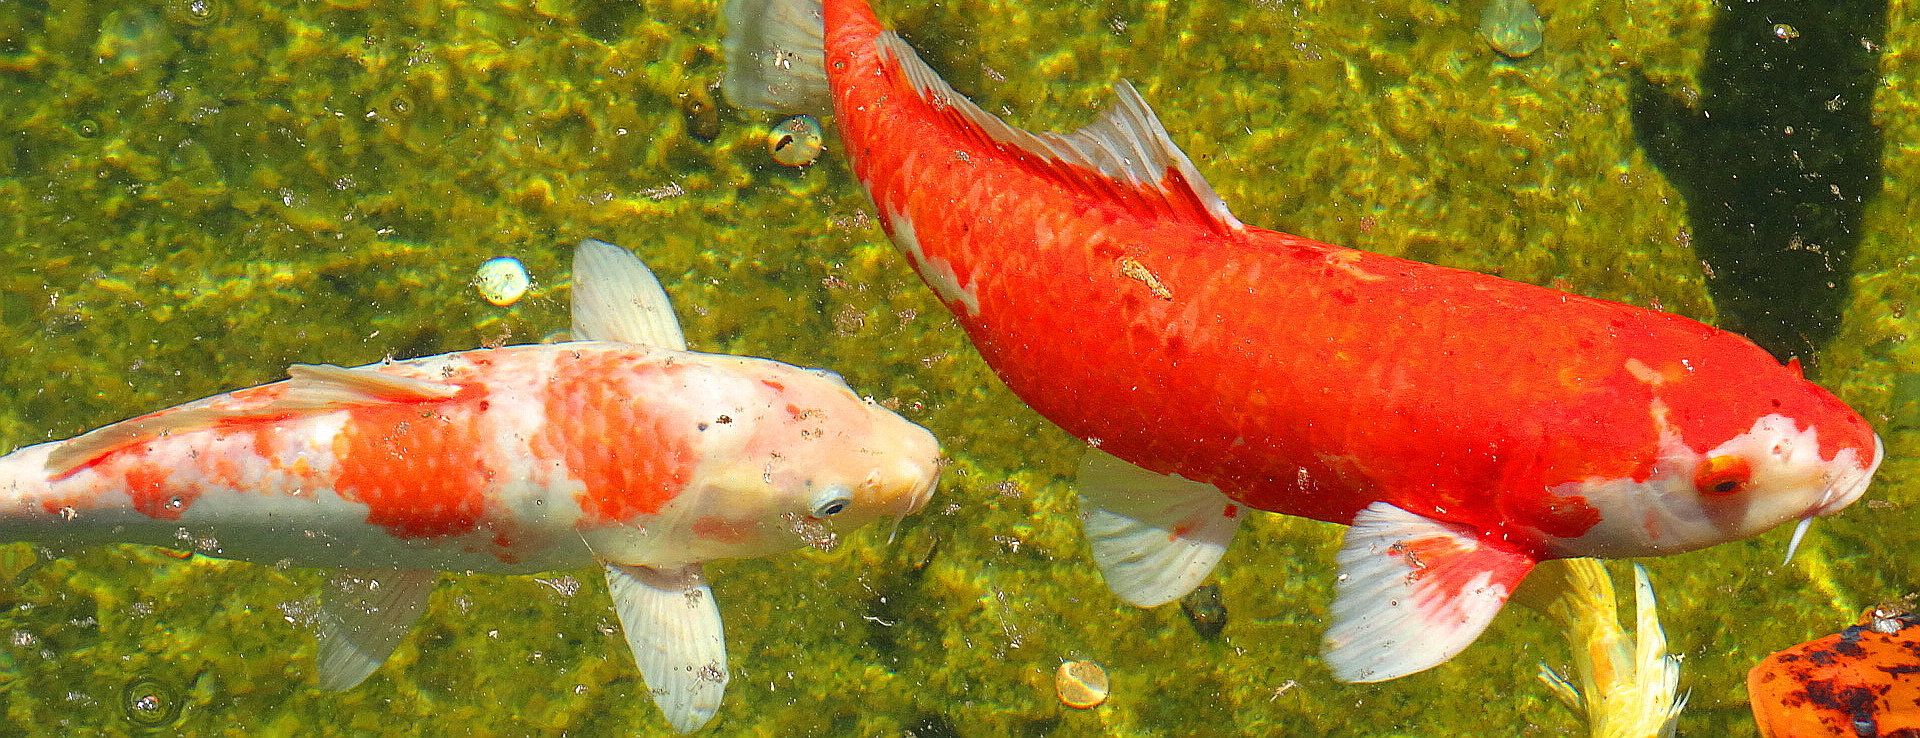 Famous Koi Fish Colors Gallery - Coloring Page - senderolasbrumas.info